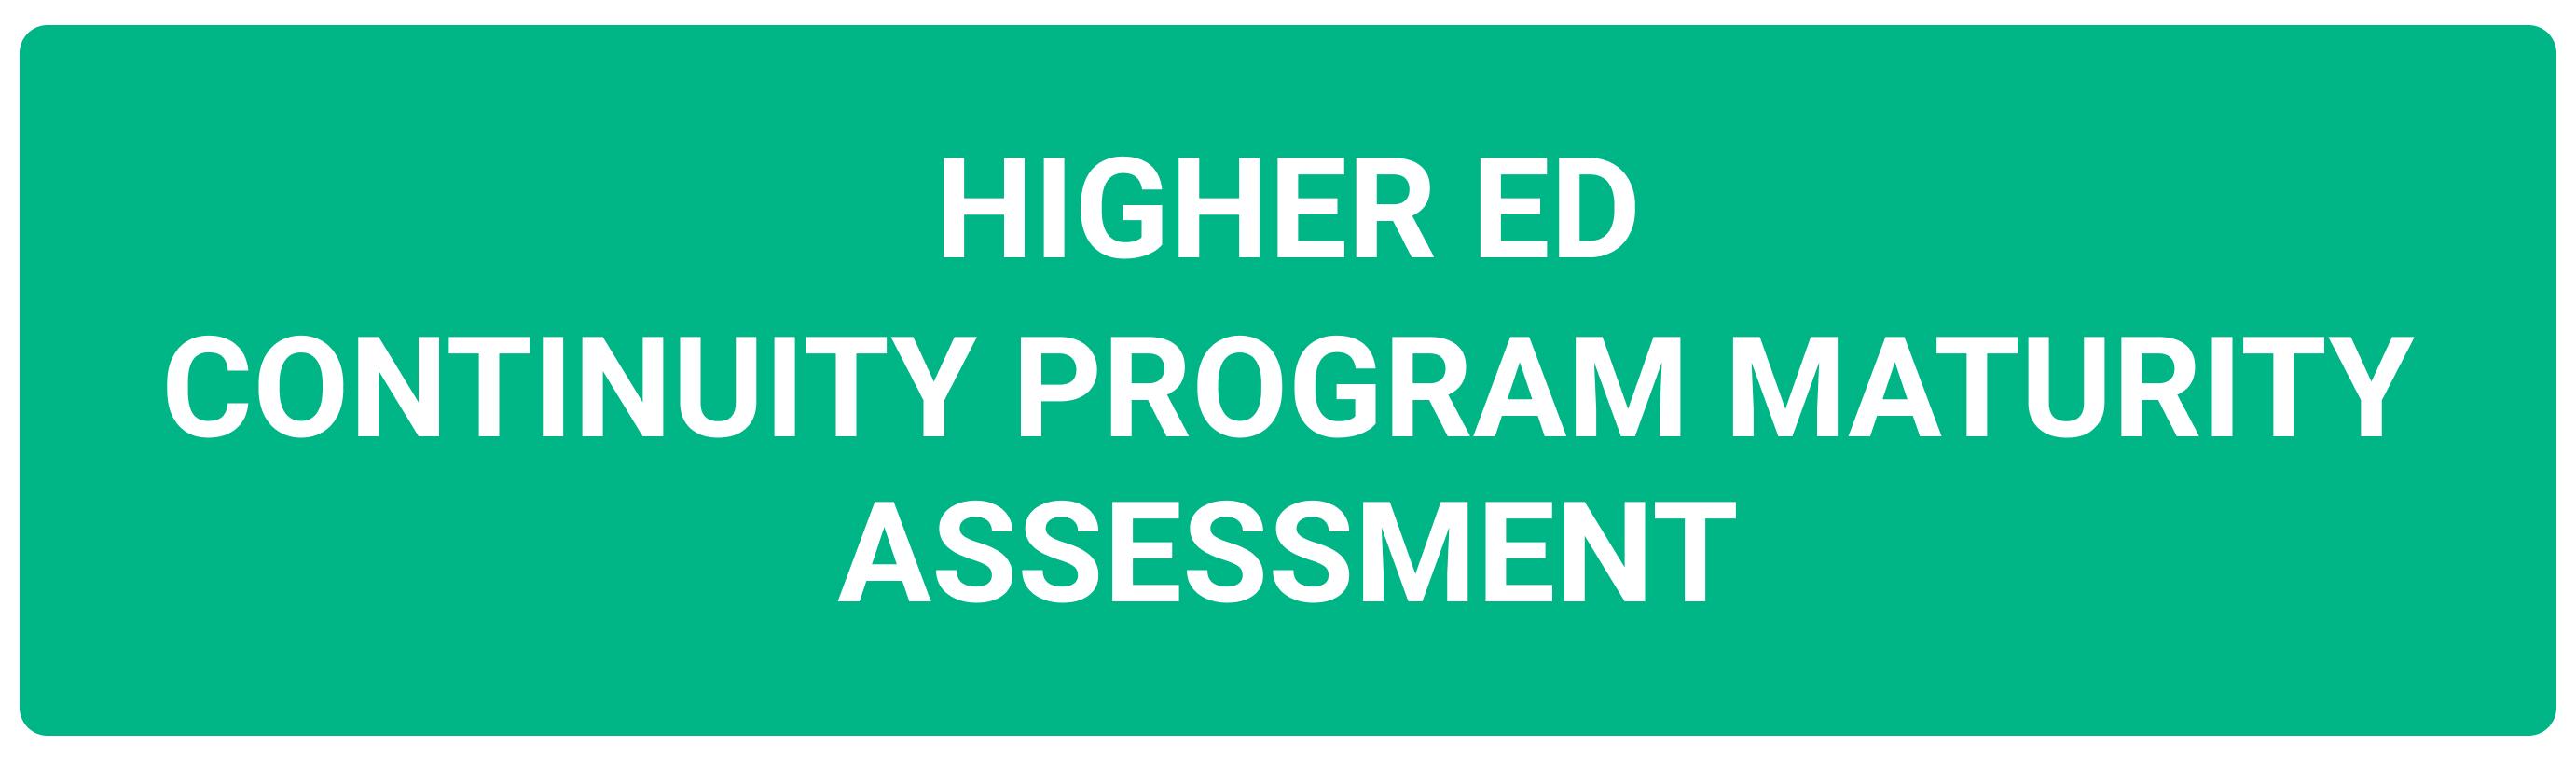 Higher Ed Continuity Program Maturity Assessment